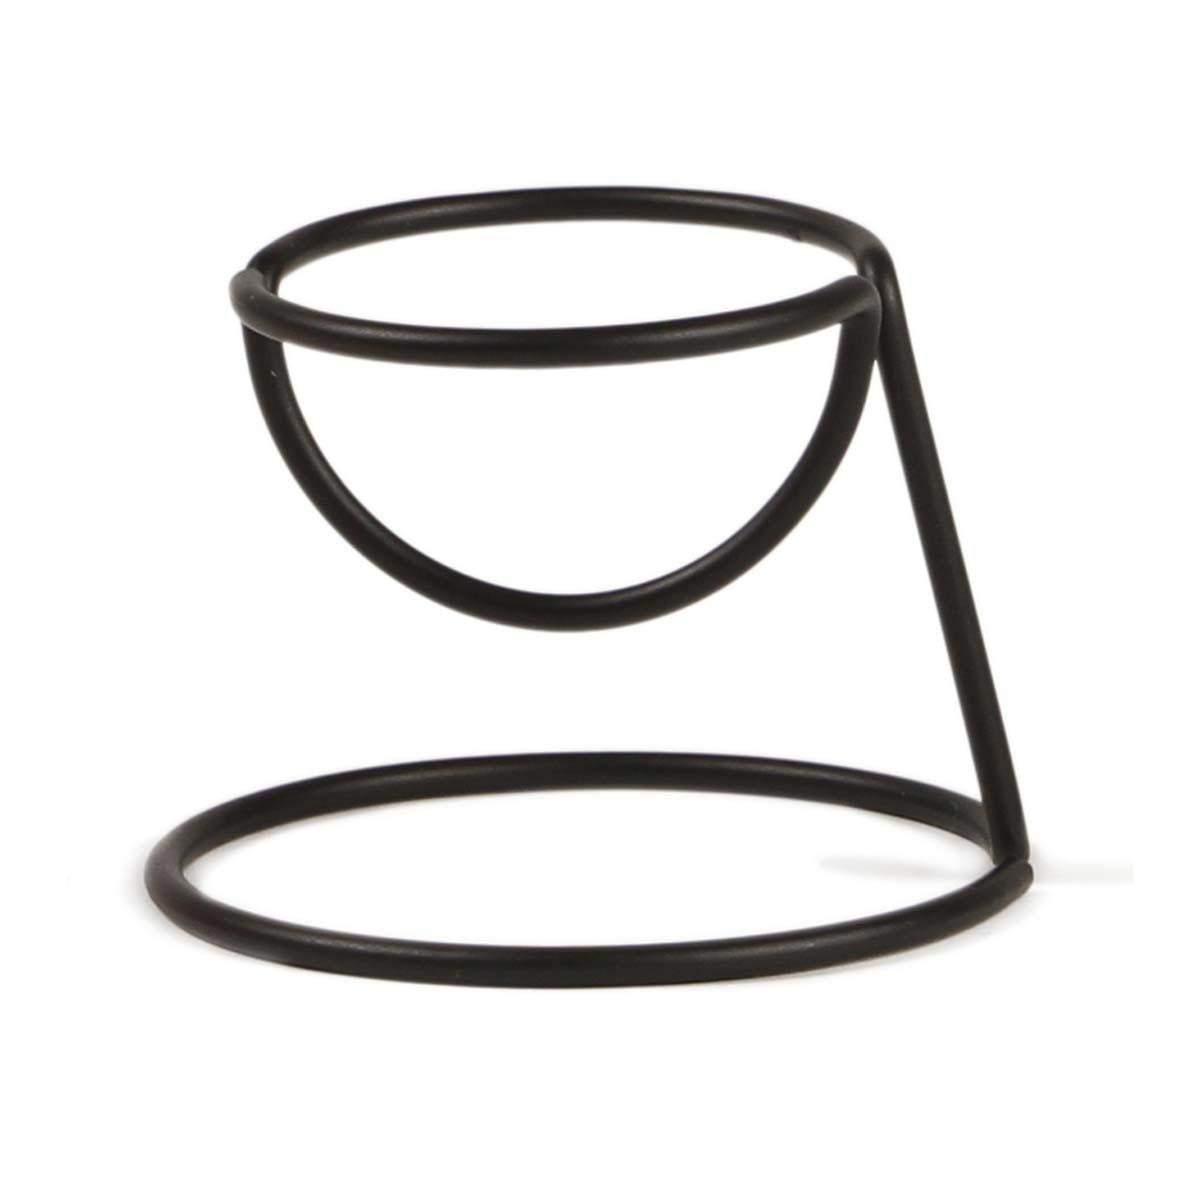 Bendo egg cup Yolk Luxe in black | The Design Gift Shop